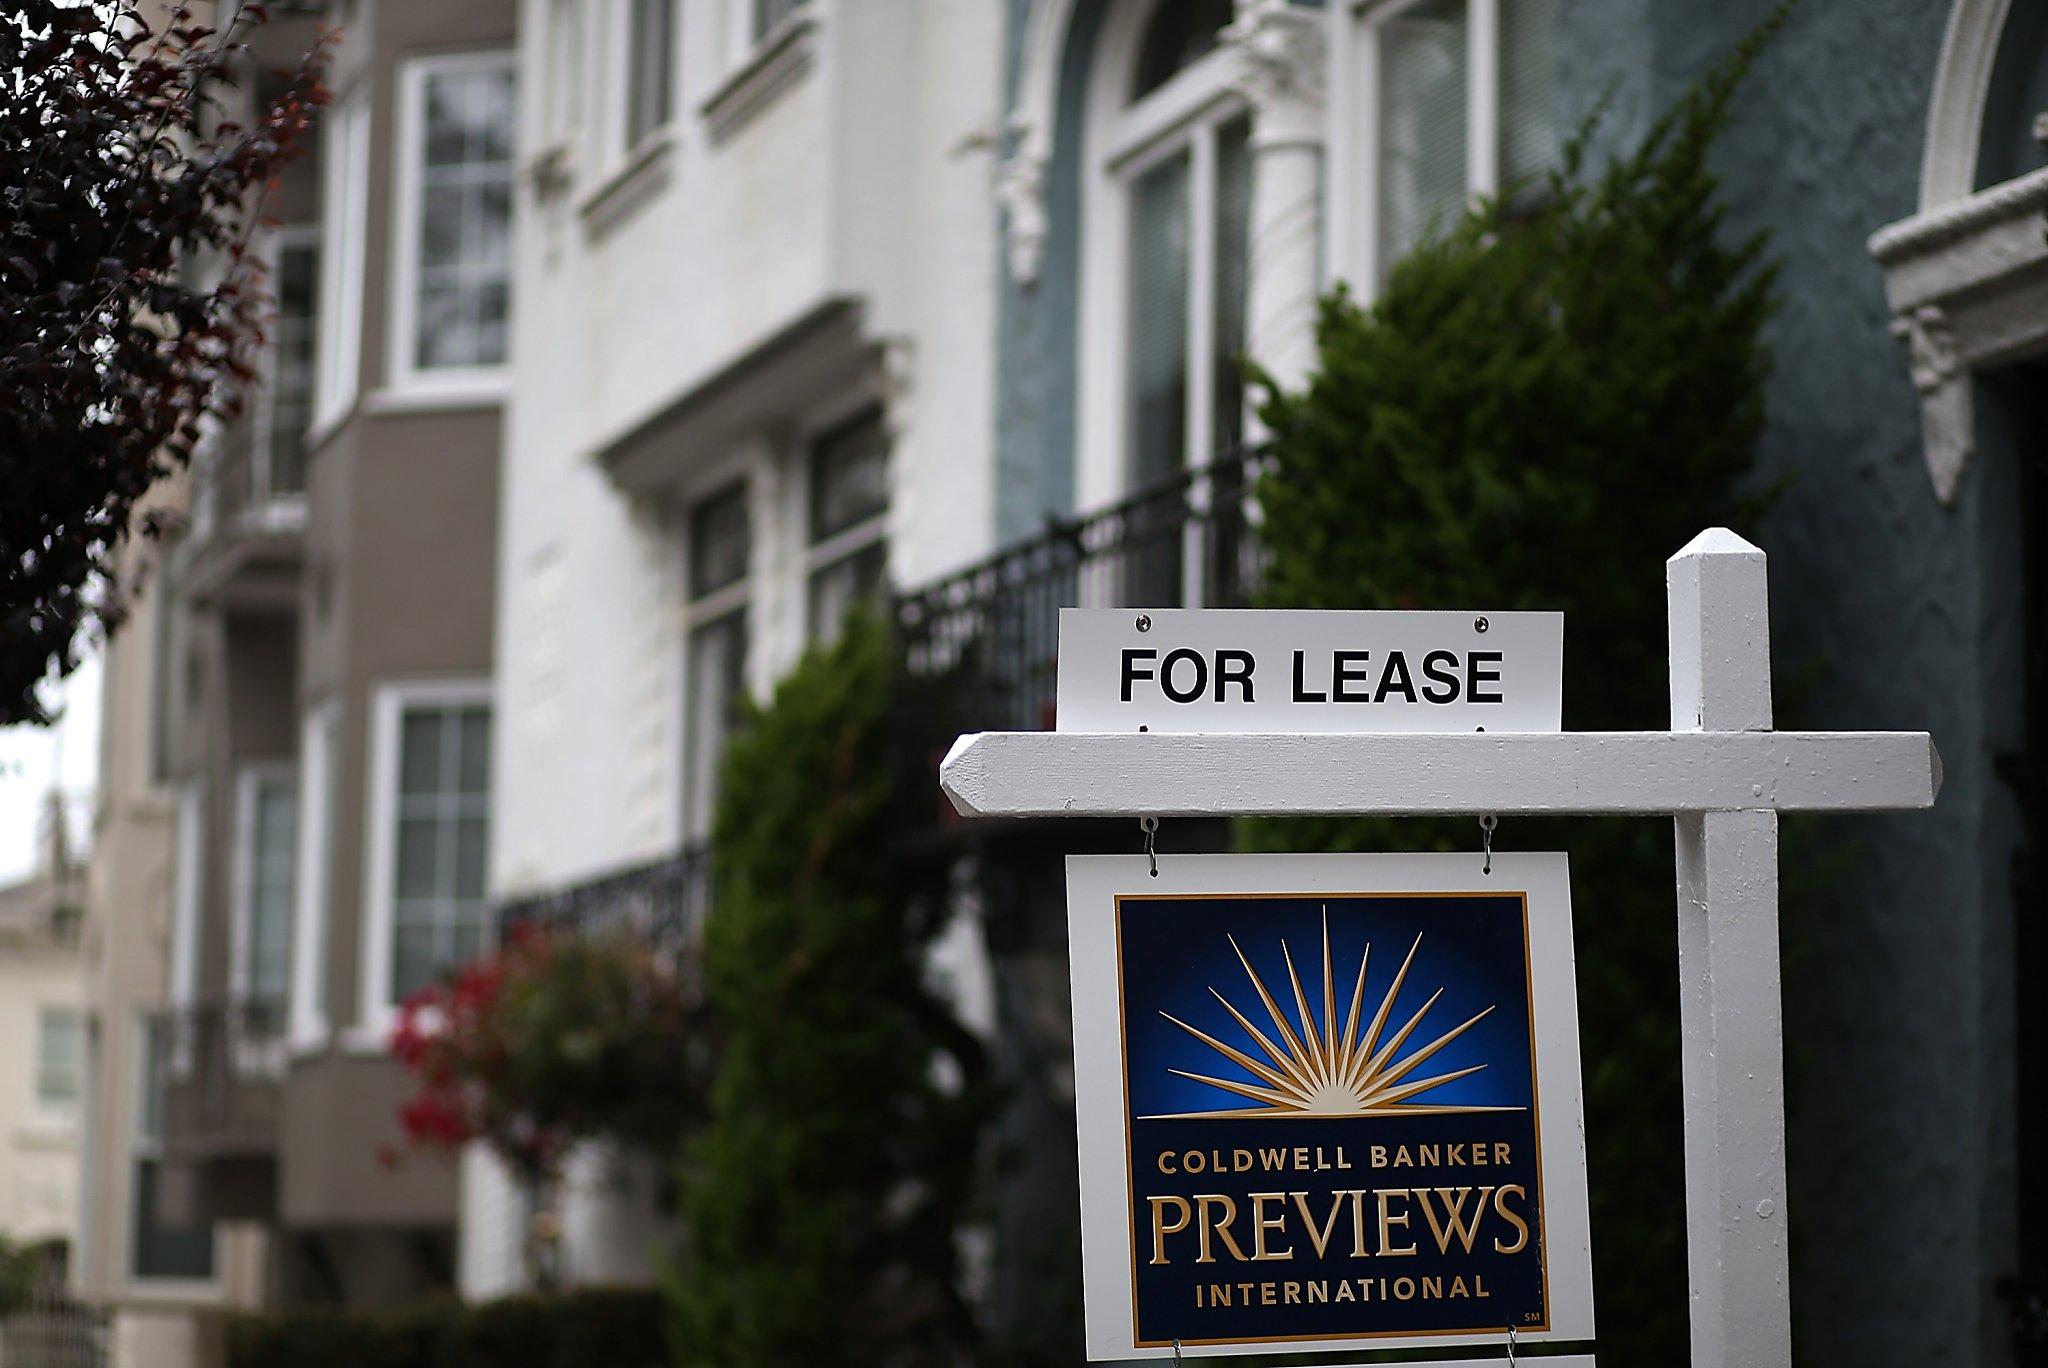 Average S F  rent hits shocking new high   3 458   San Francisco Chronicle. Average S F  rent hits shocking new high   3 458   San Francisco